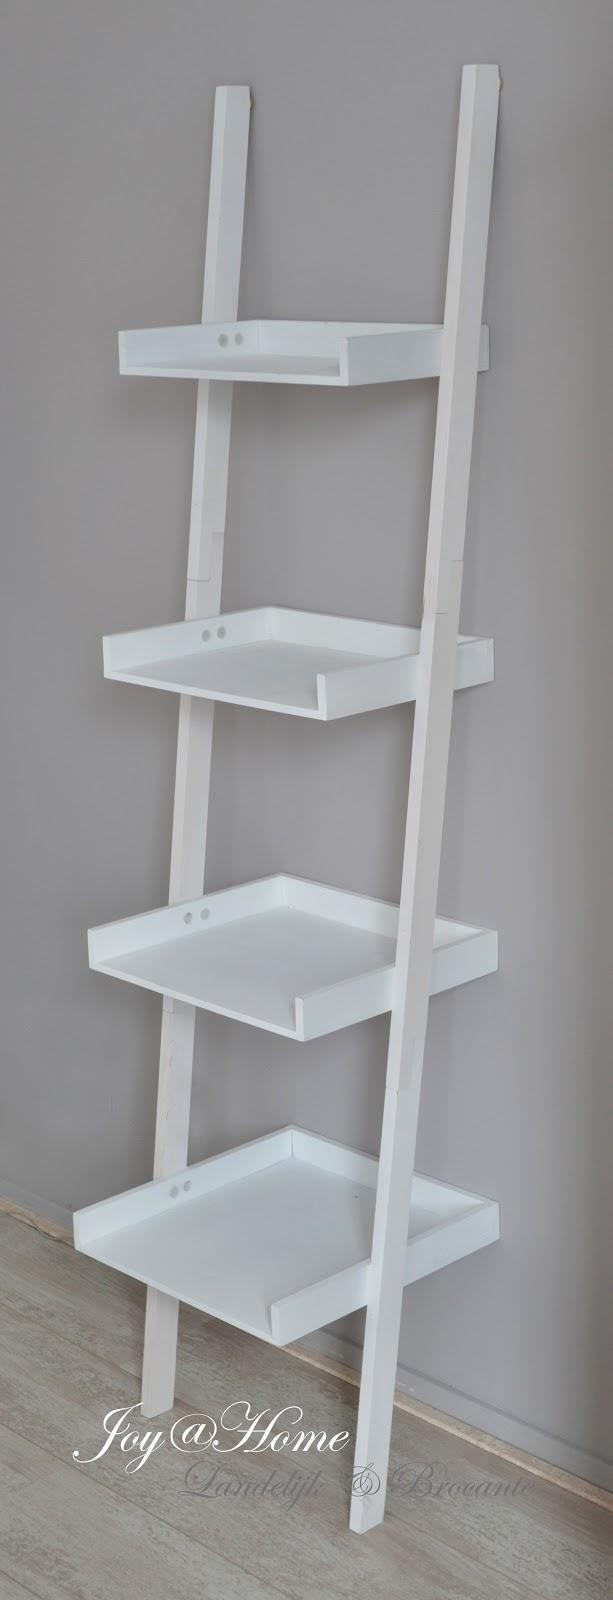 Joy home living soap gifts landelijke sidetable trap als wandrek - Schilderij trap ...